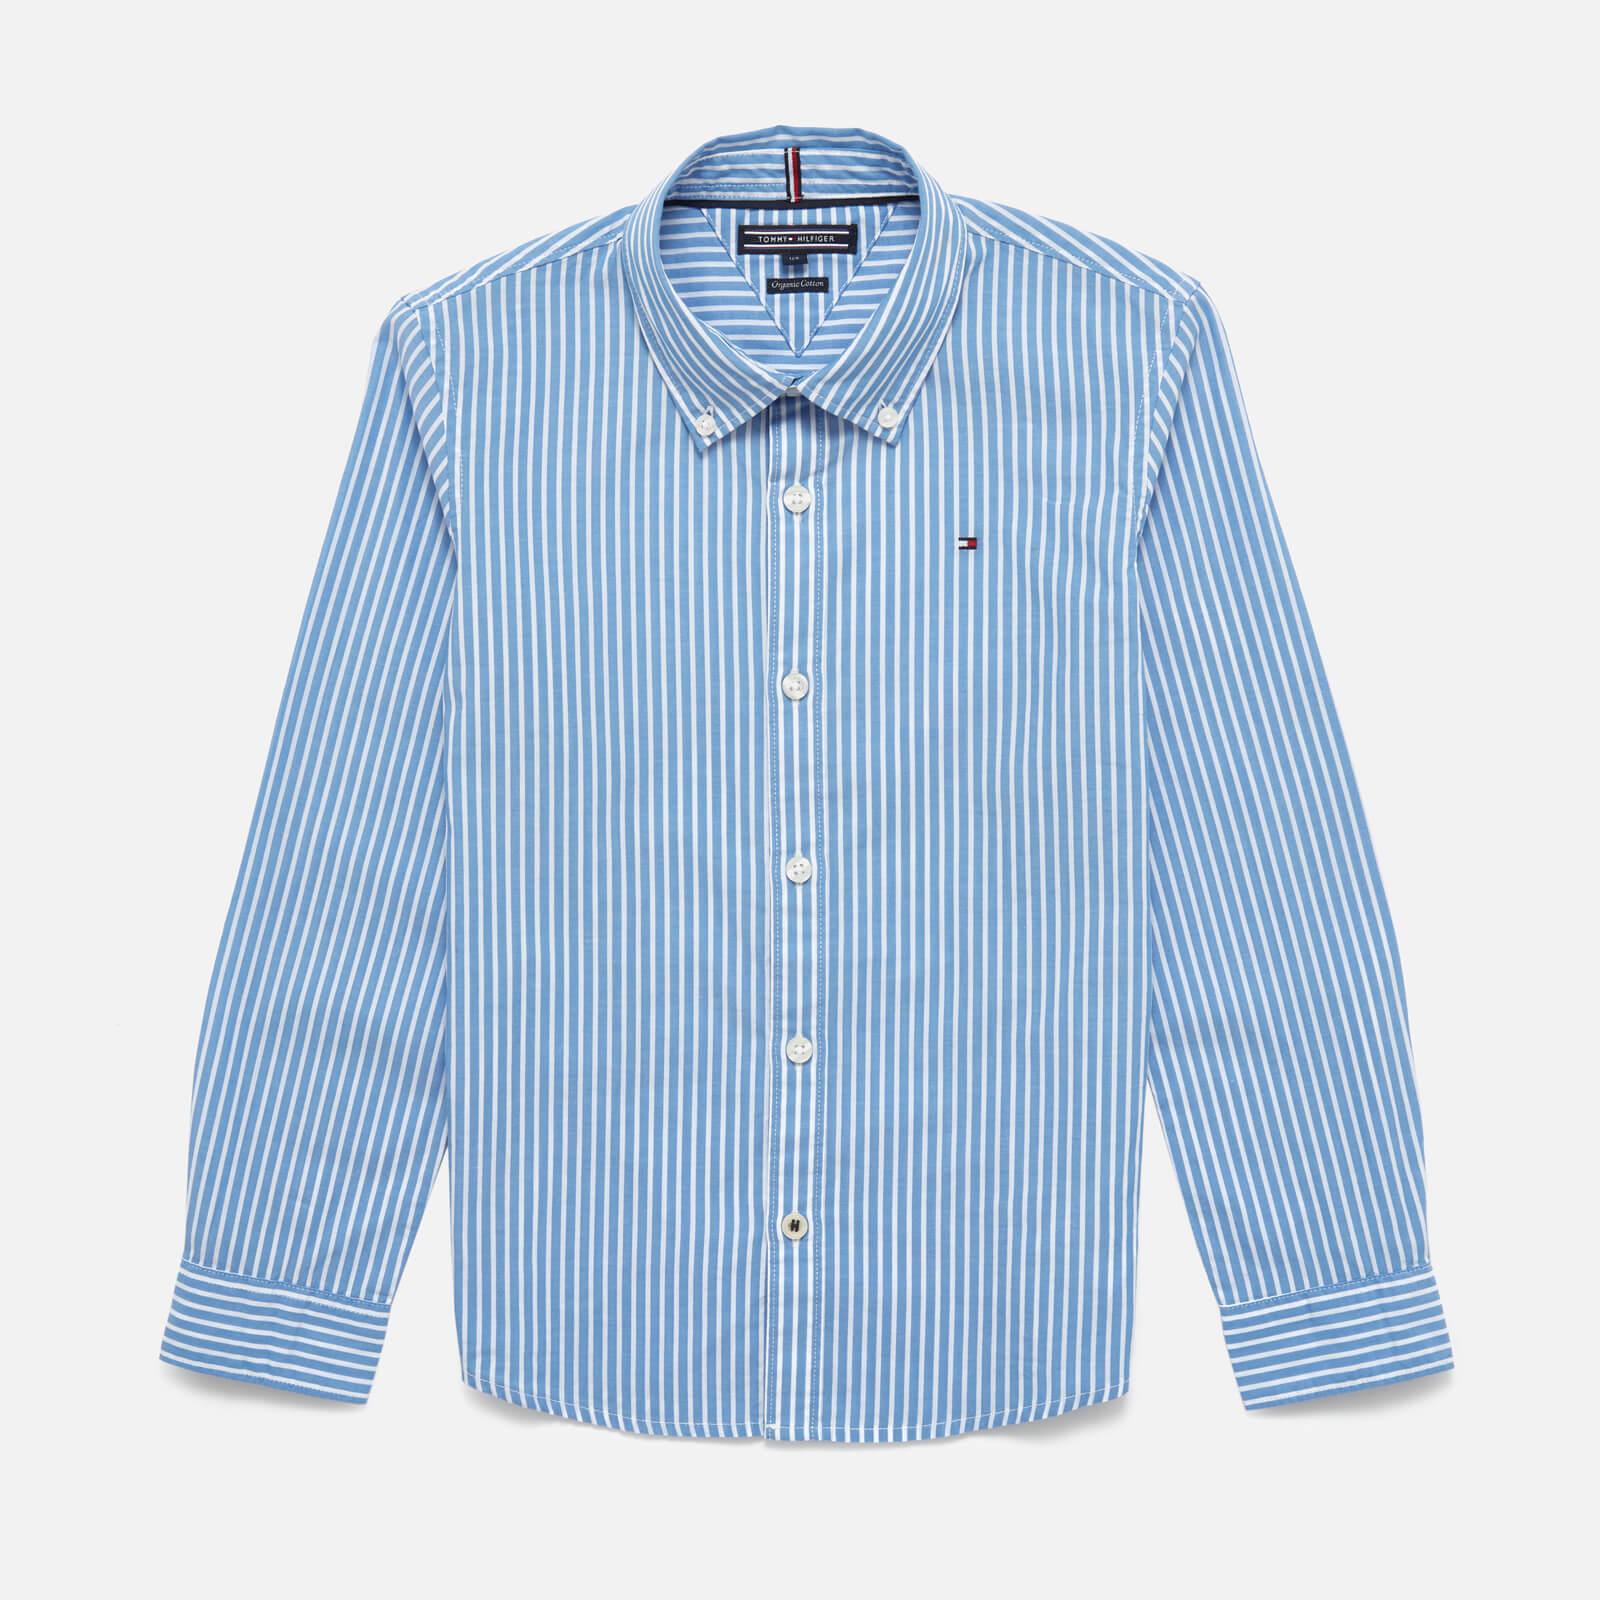 Tommy Kids Boys' Long Sleeve Stripe Shirt - Shirt Blue - 7 Years